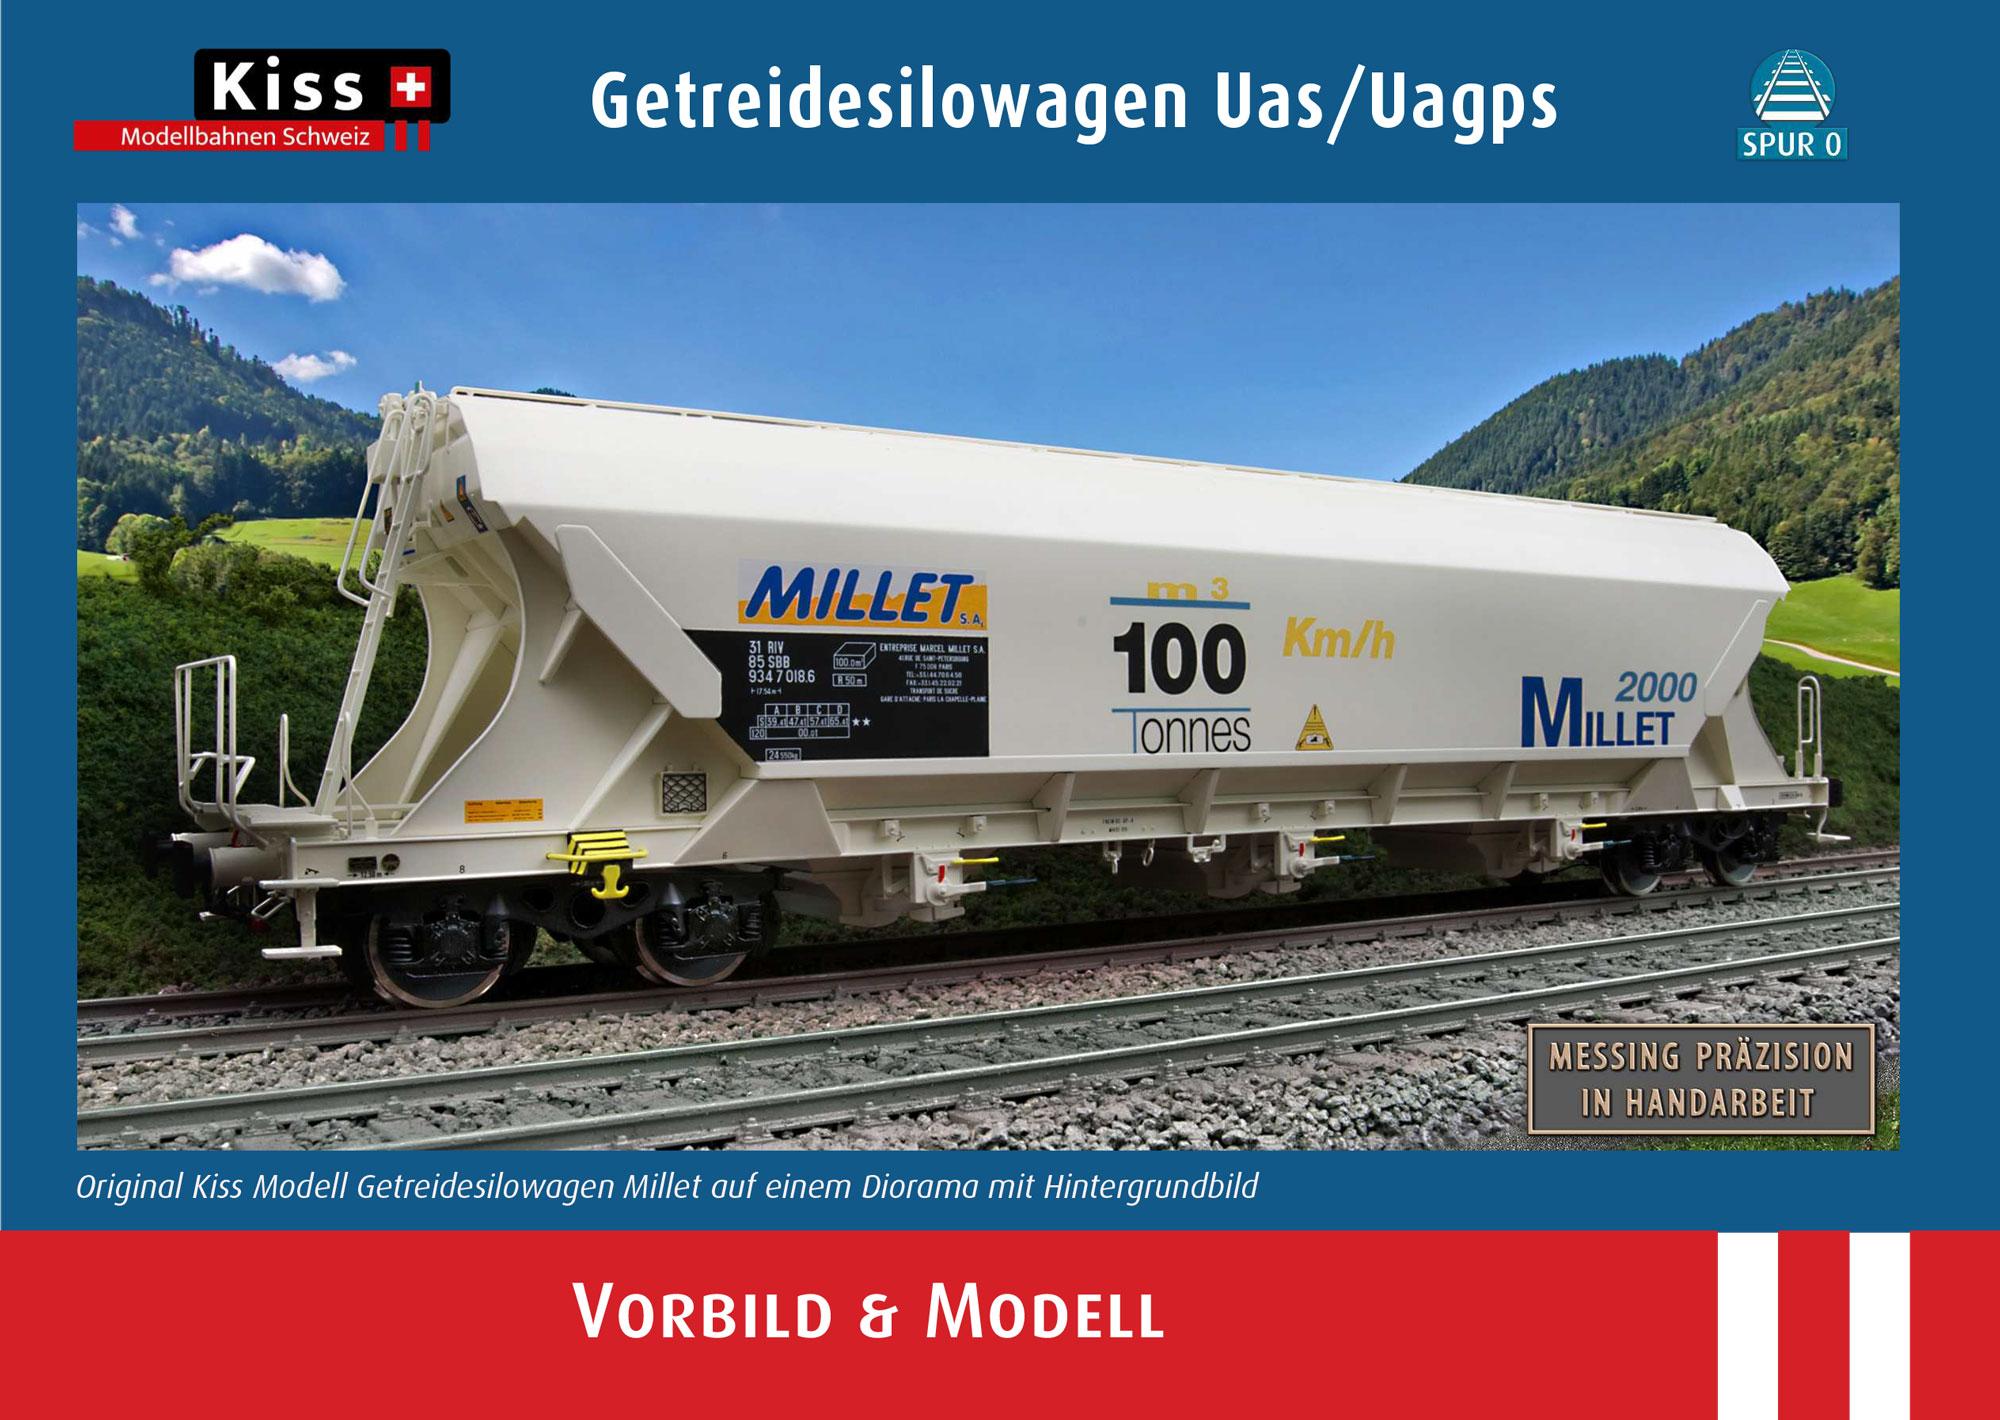 Kiss Modellbahnen Schweiz - Uas/Uagps freight wagons